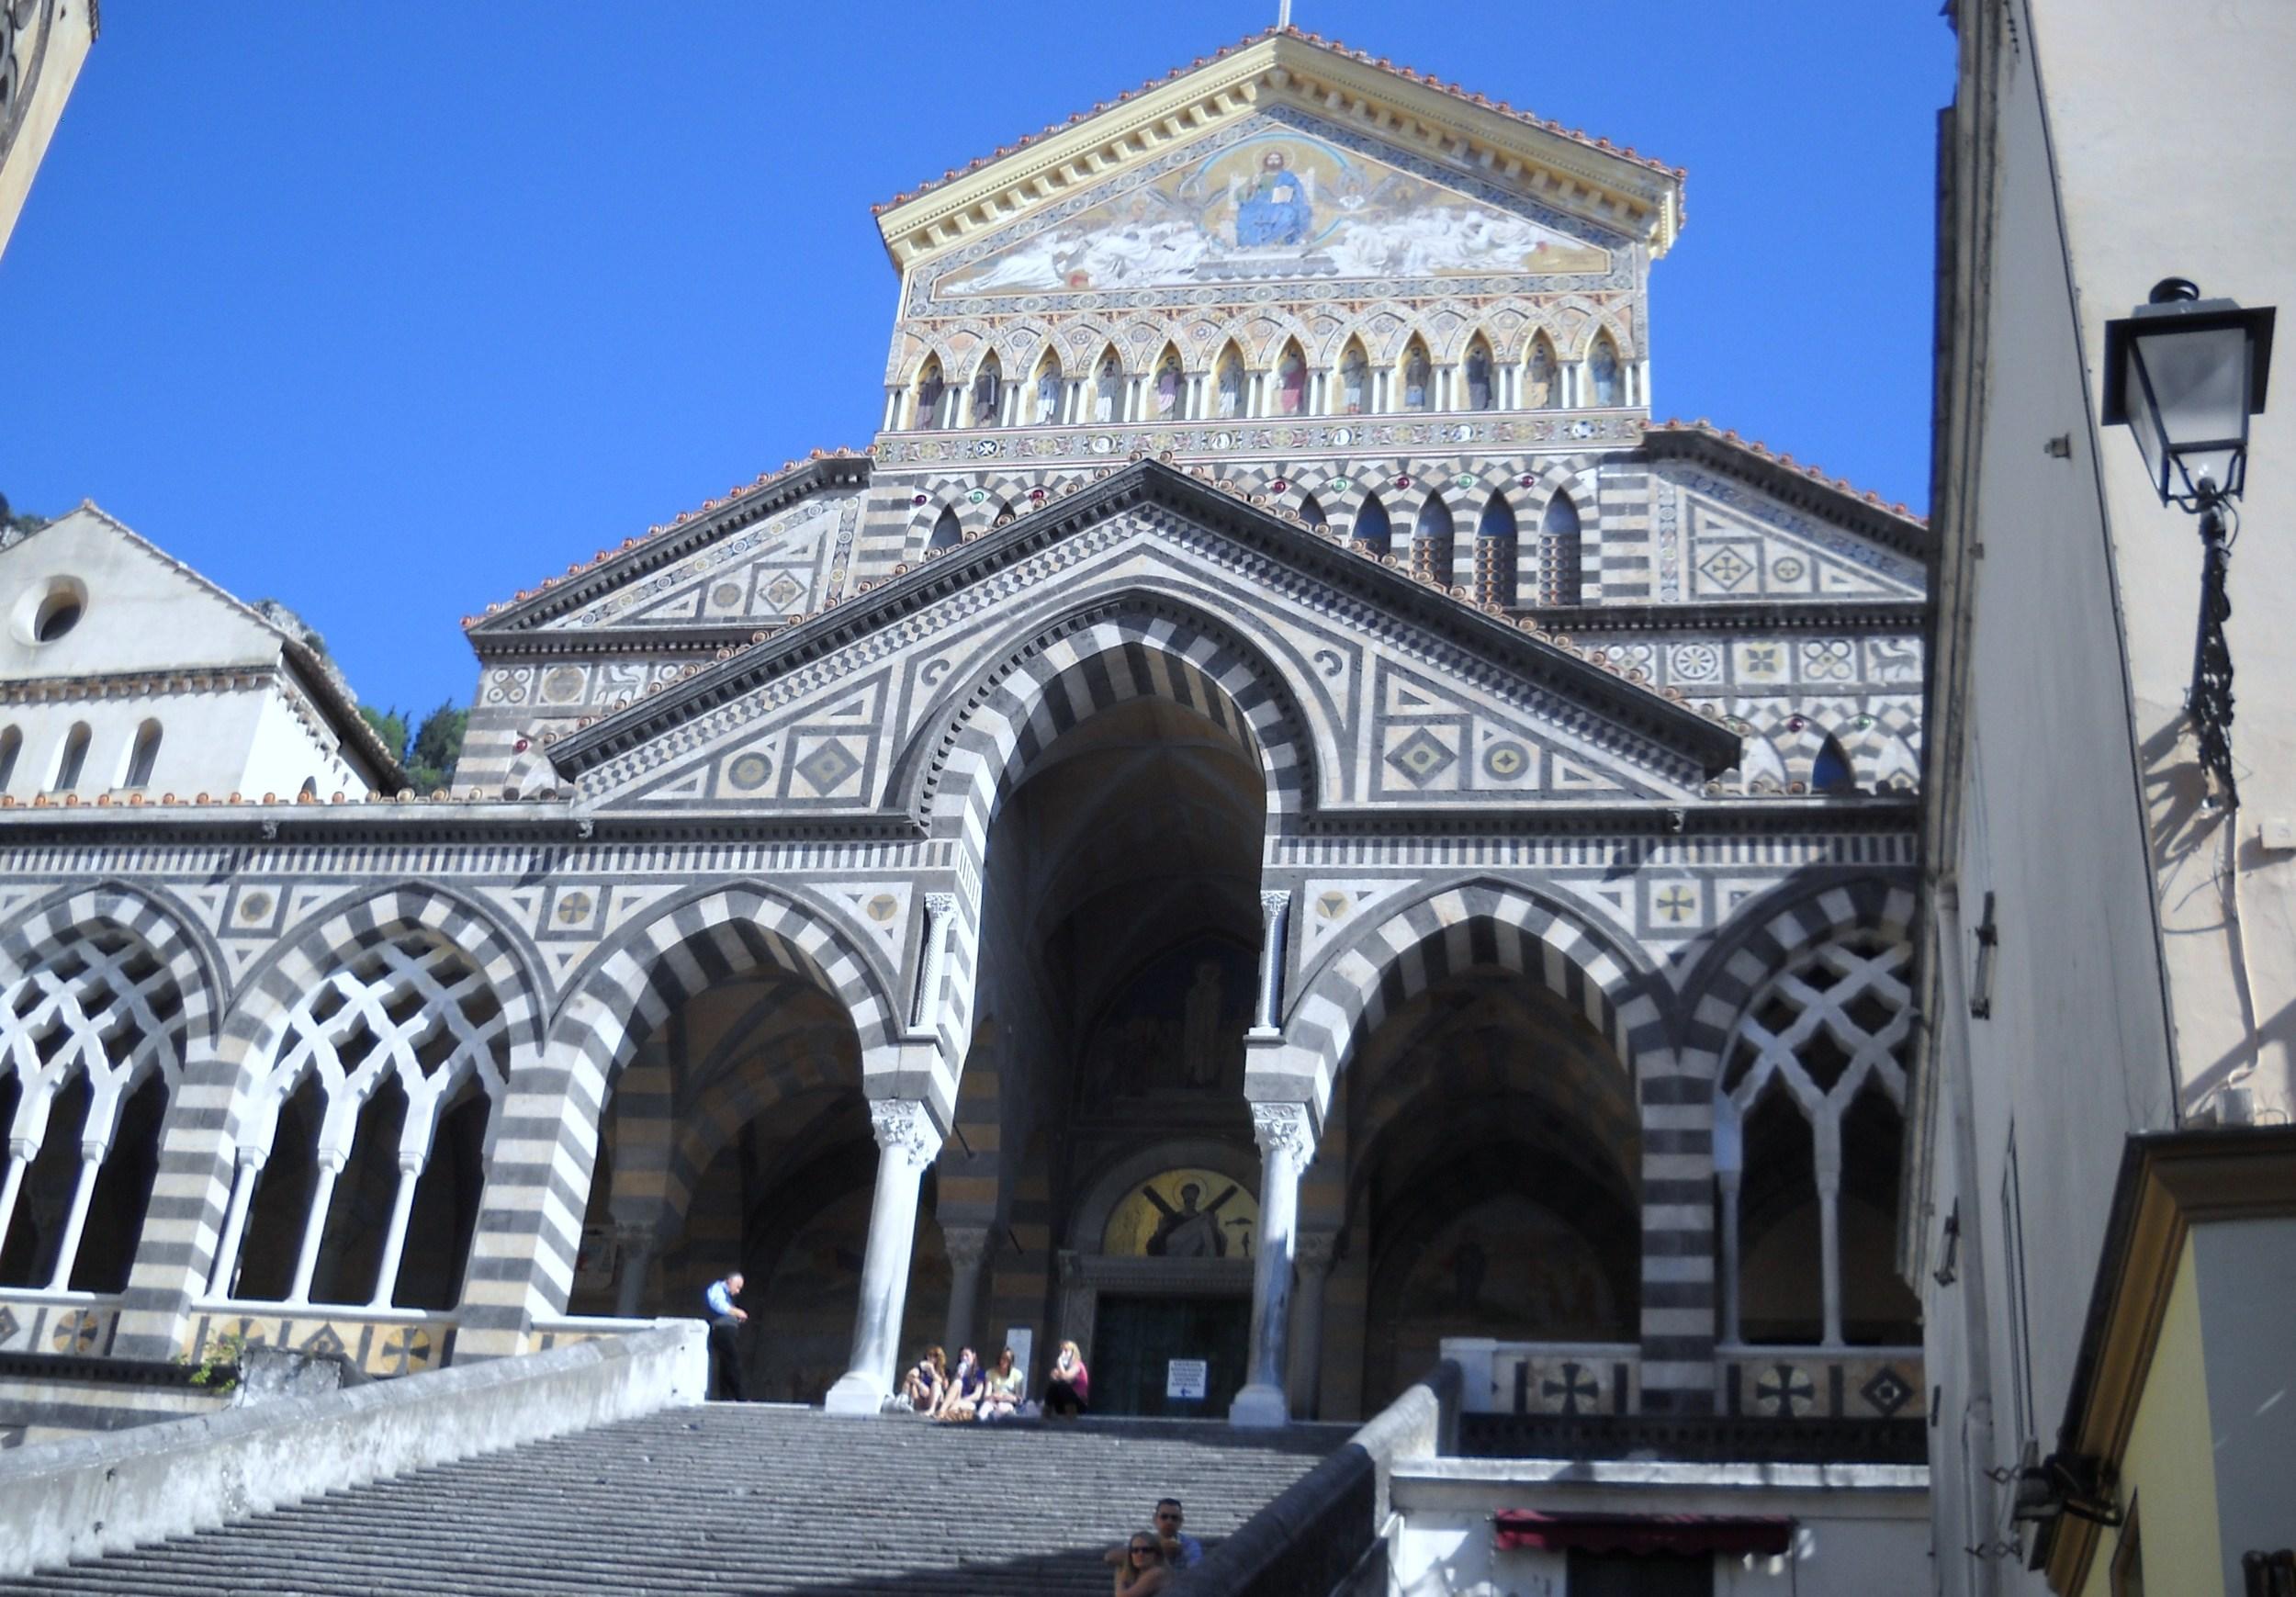 CRO Italy web 2009 - 24.jpg